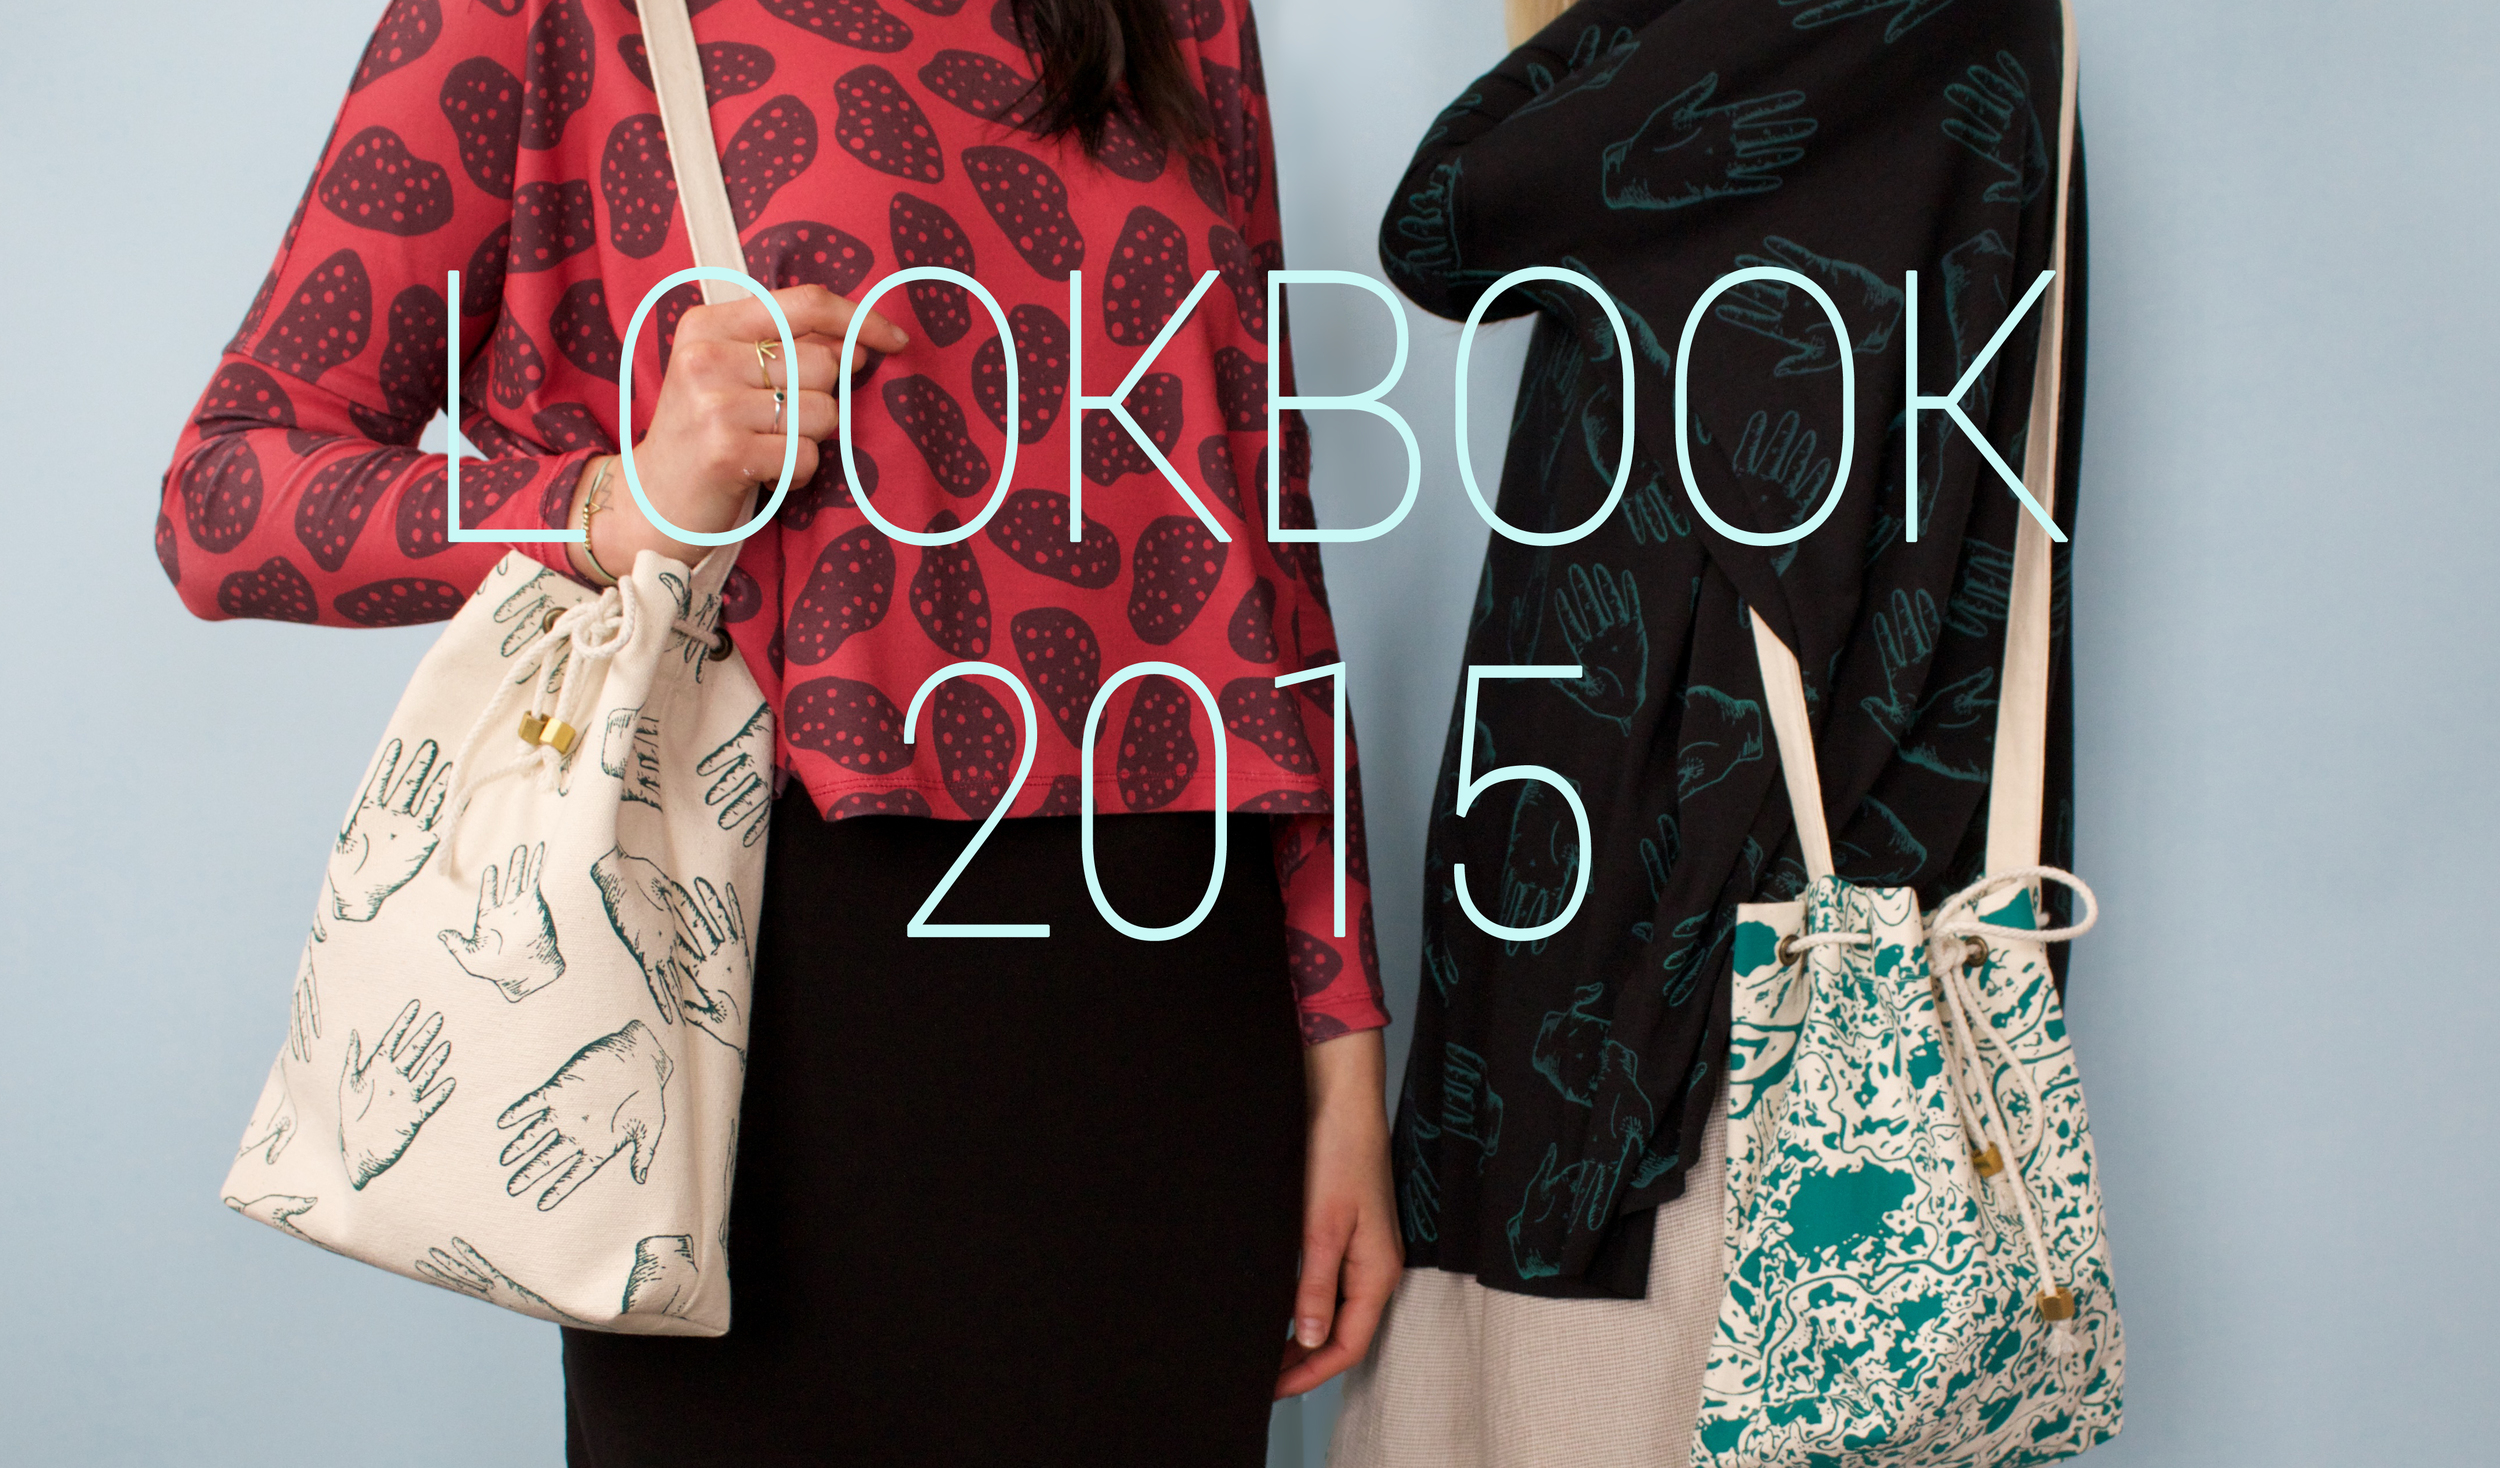 lookbookcover3.jpg